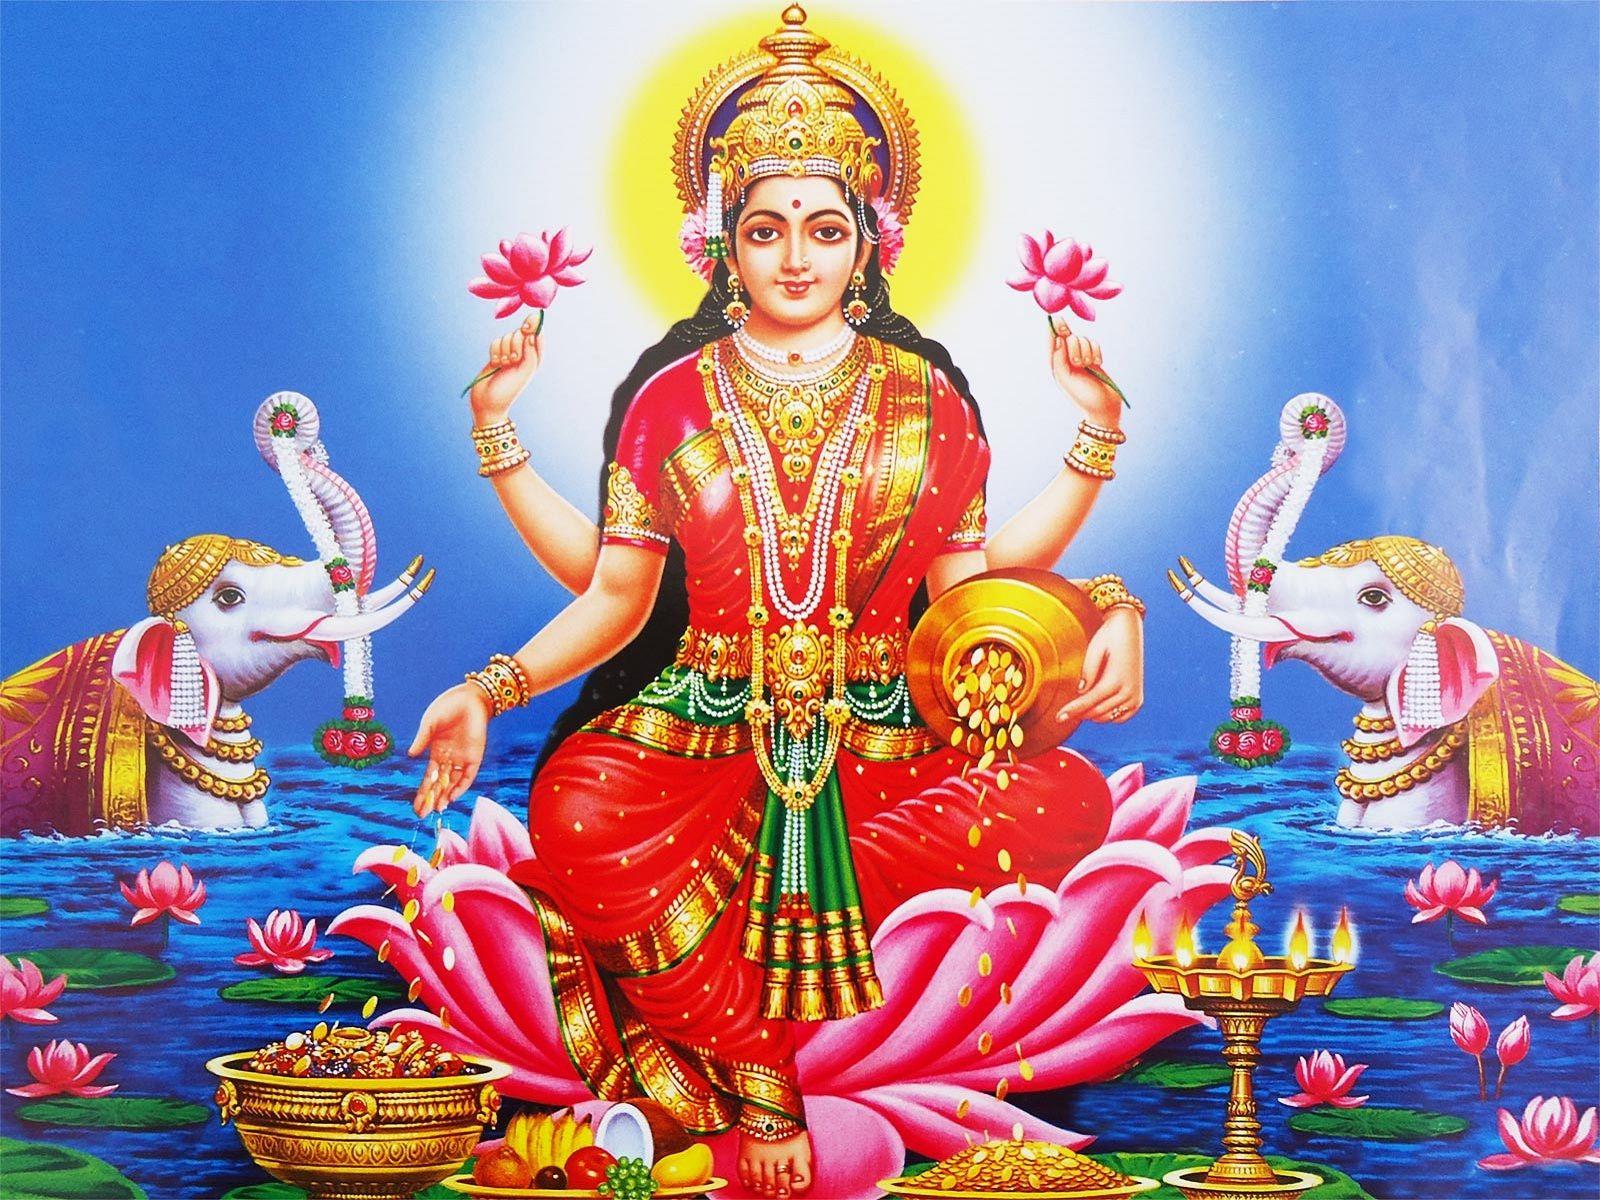 hindu god wallpapers free download download best hd desktop